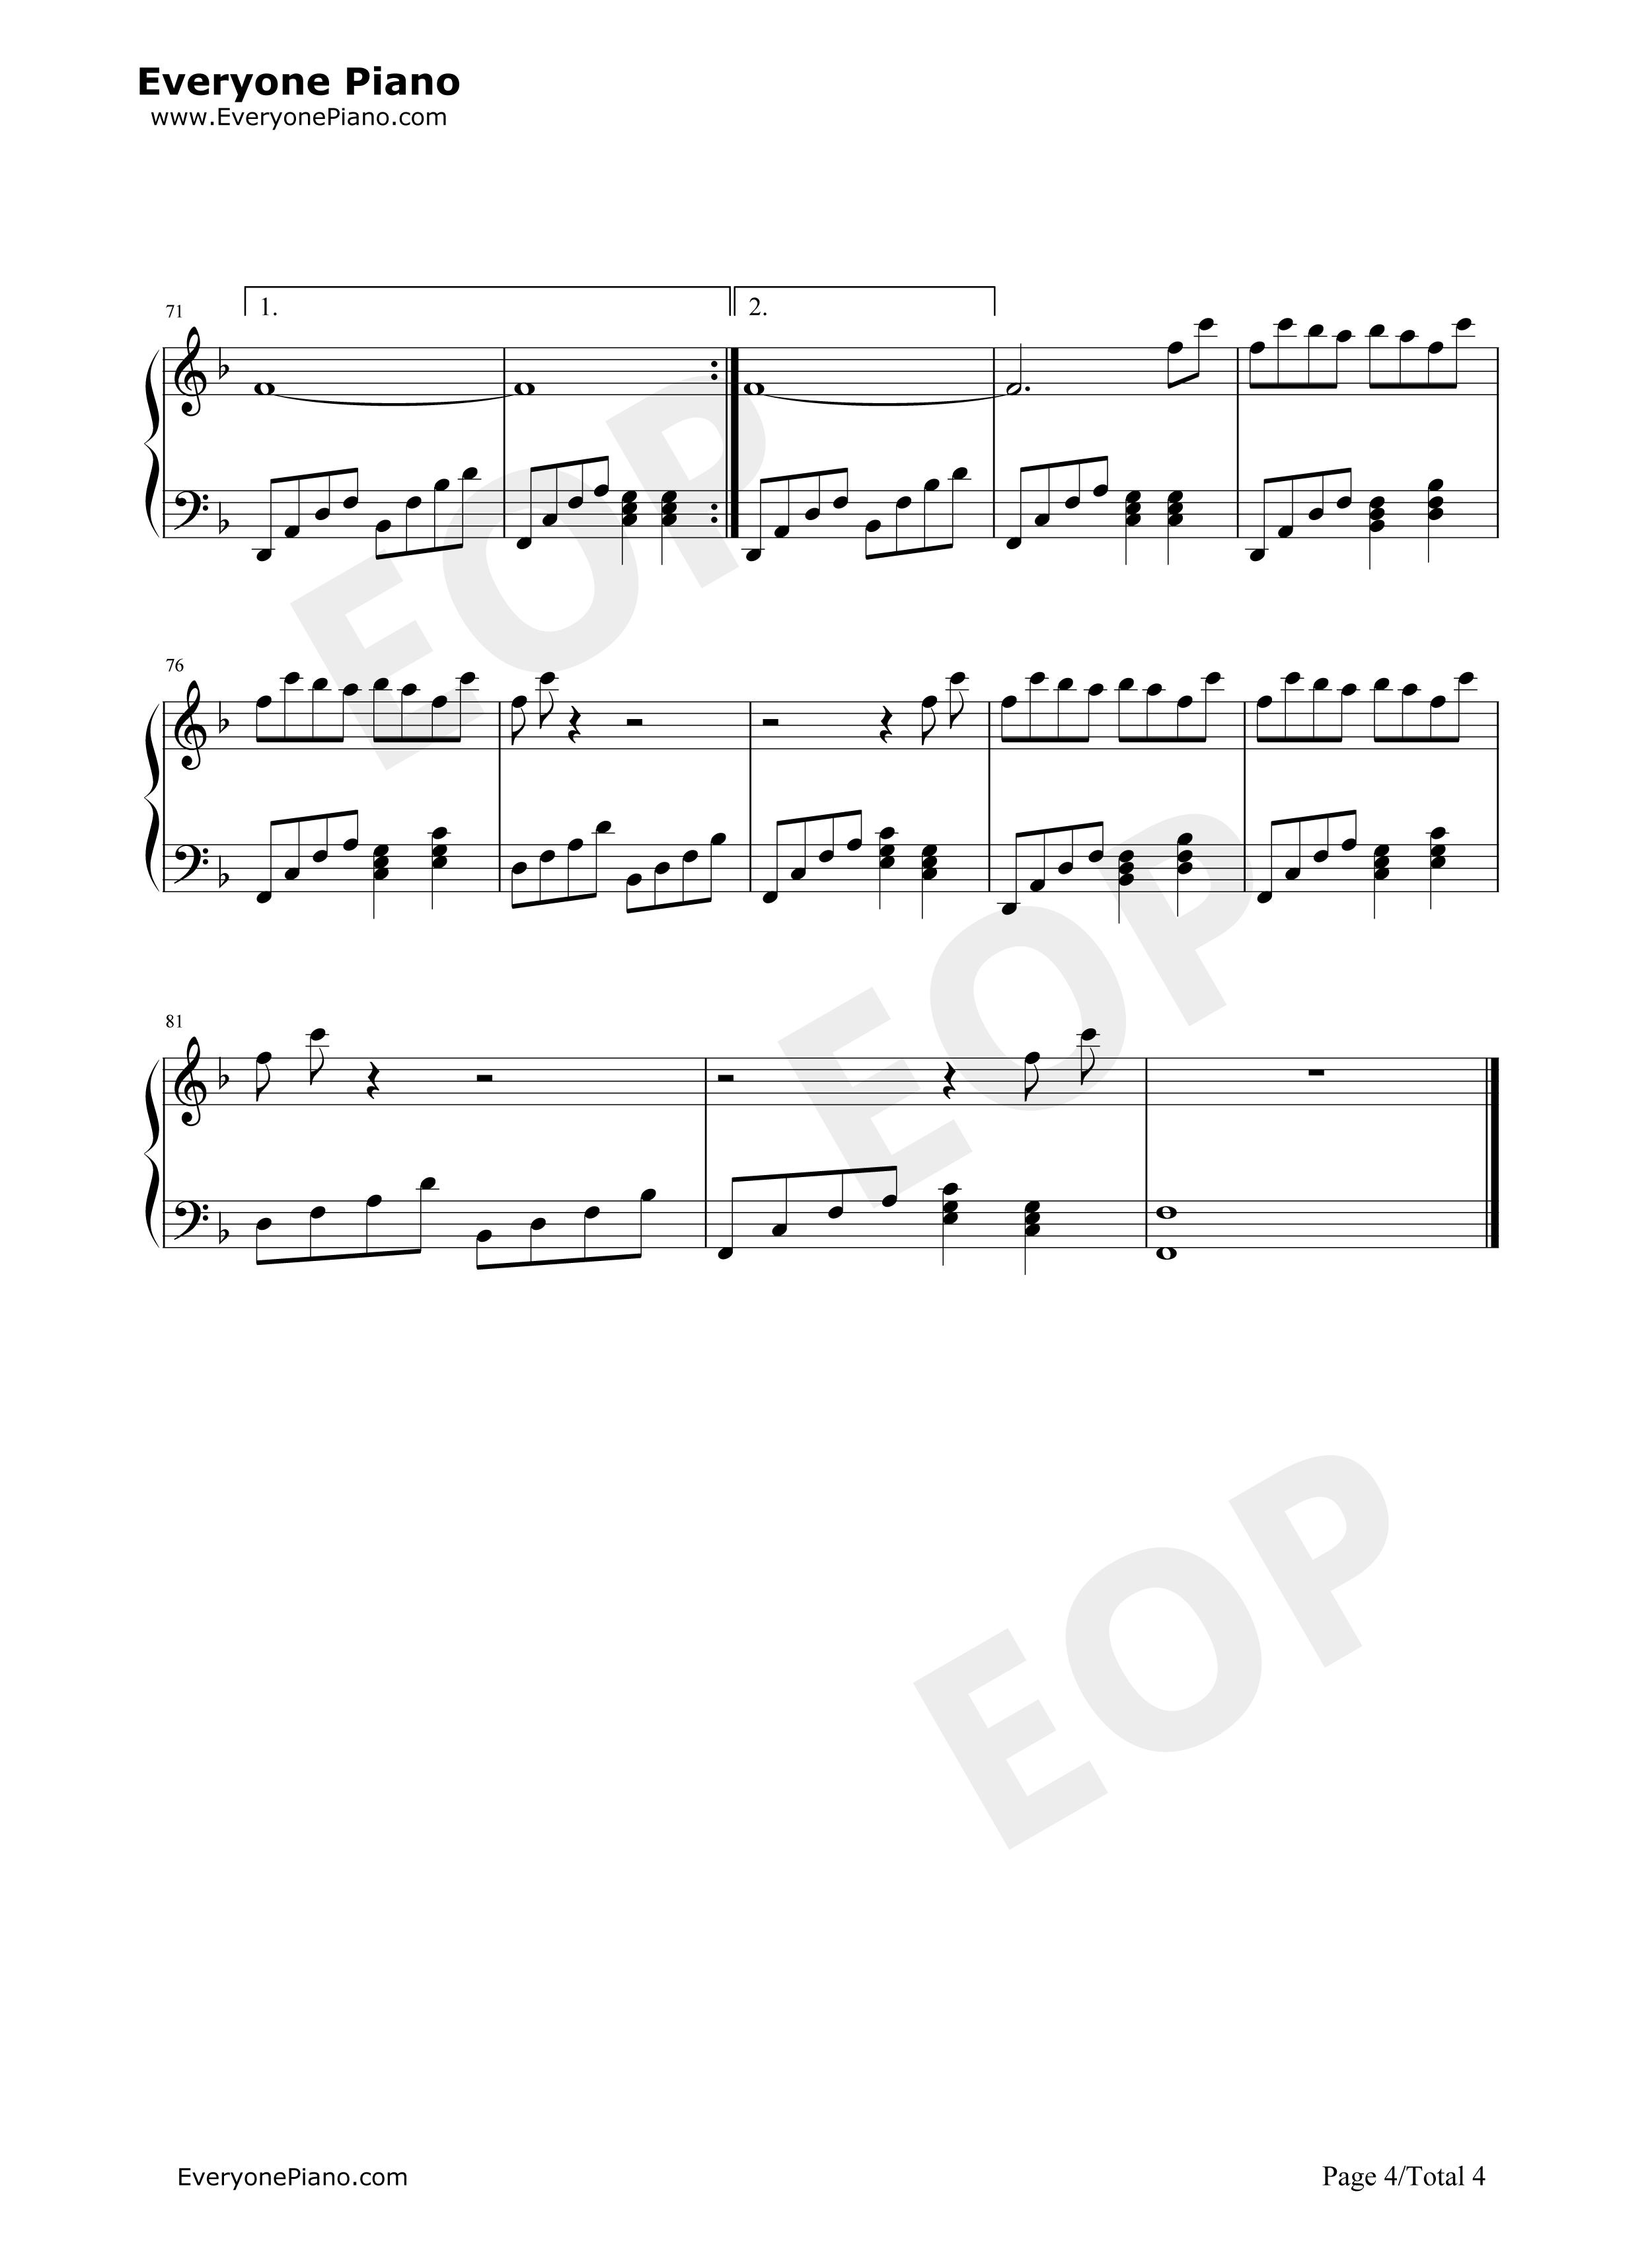 Beautiful world evangelion theme song 6